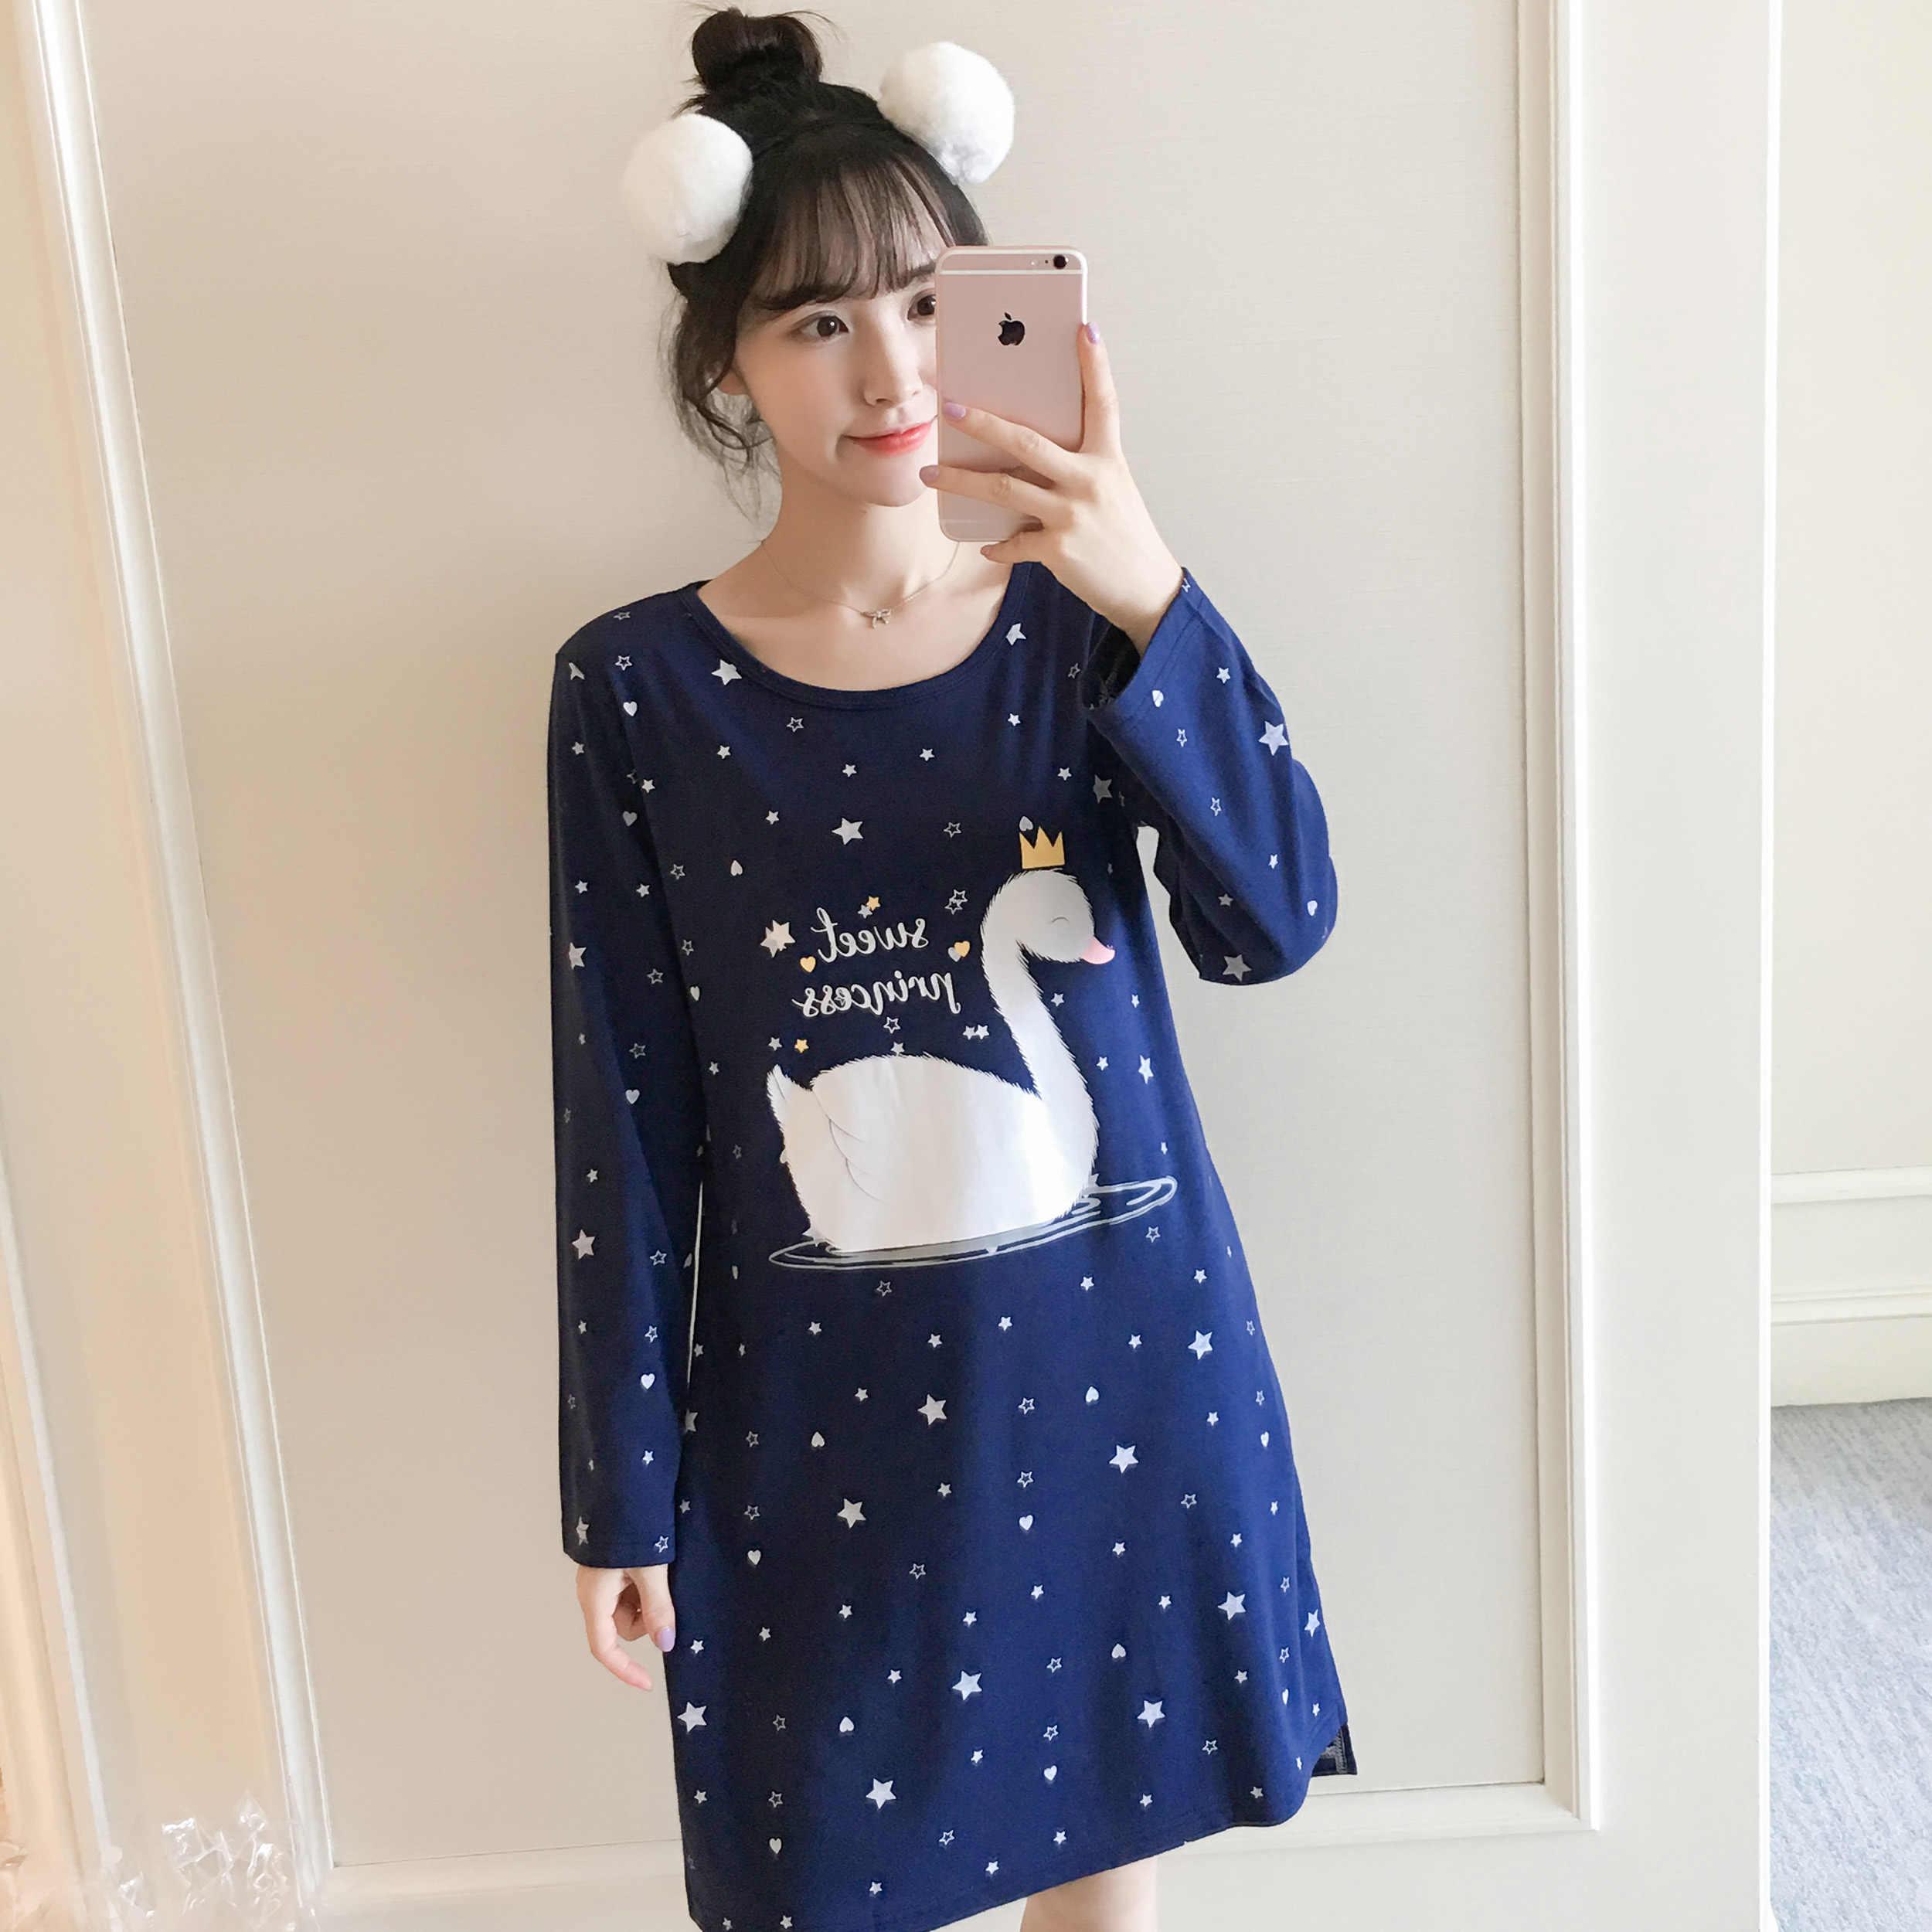 c2ed565138 2018 Autumn Winter Warm Cotton Nightgown Girl Sleepwear Nightgown Cartoon  Print Nightdress Home Wear Lovely Nightgowns